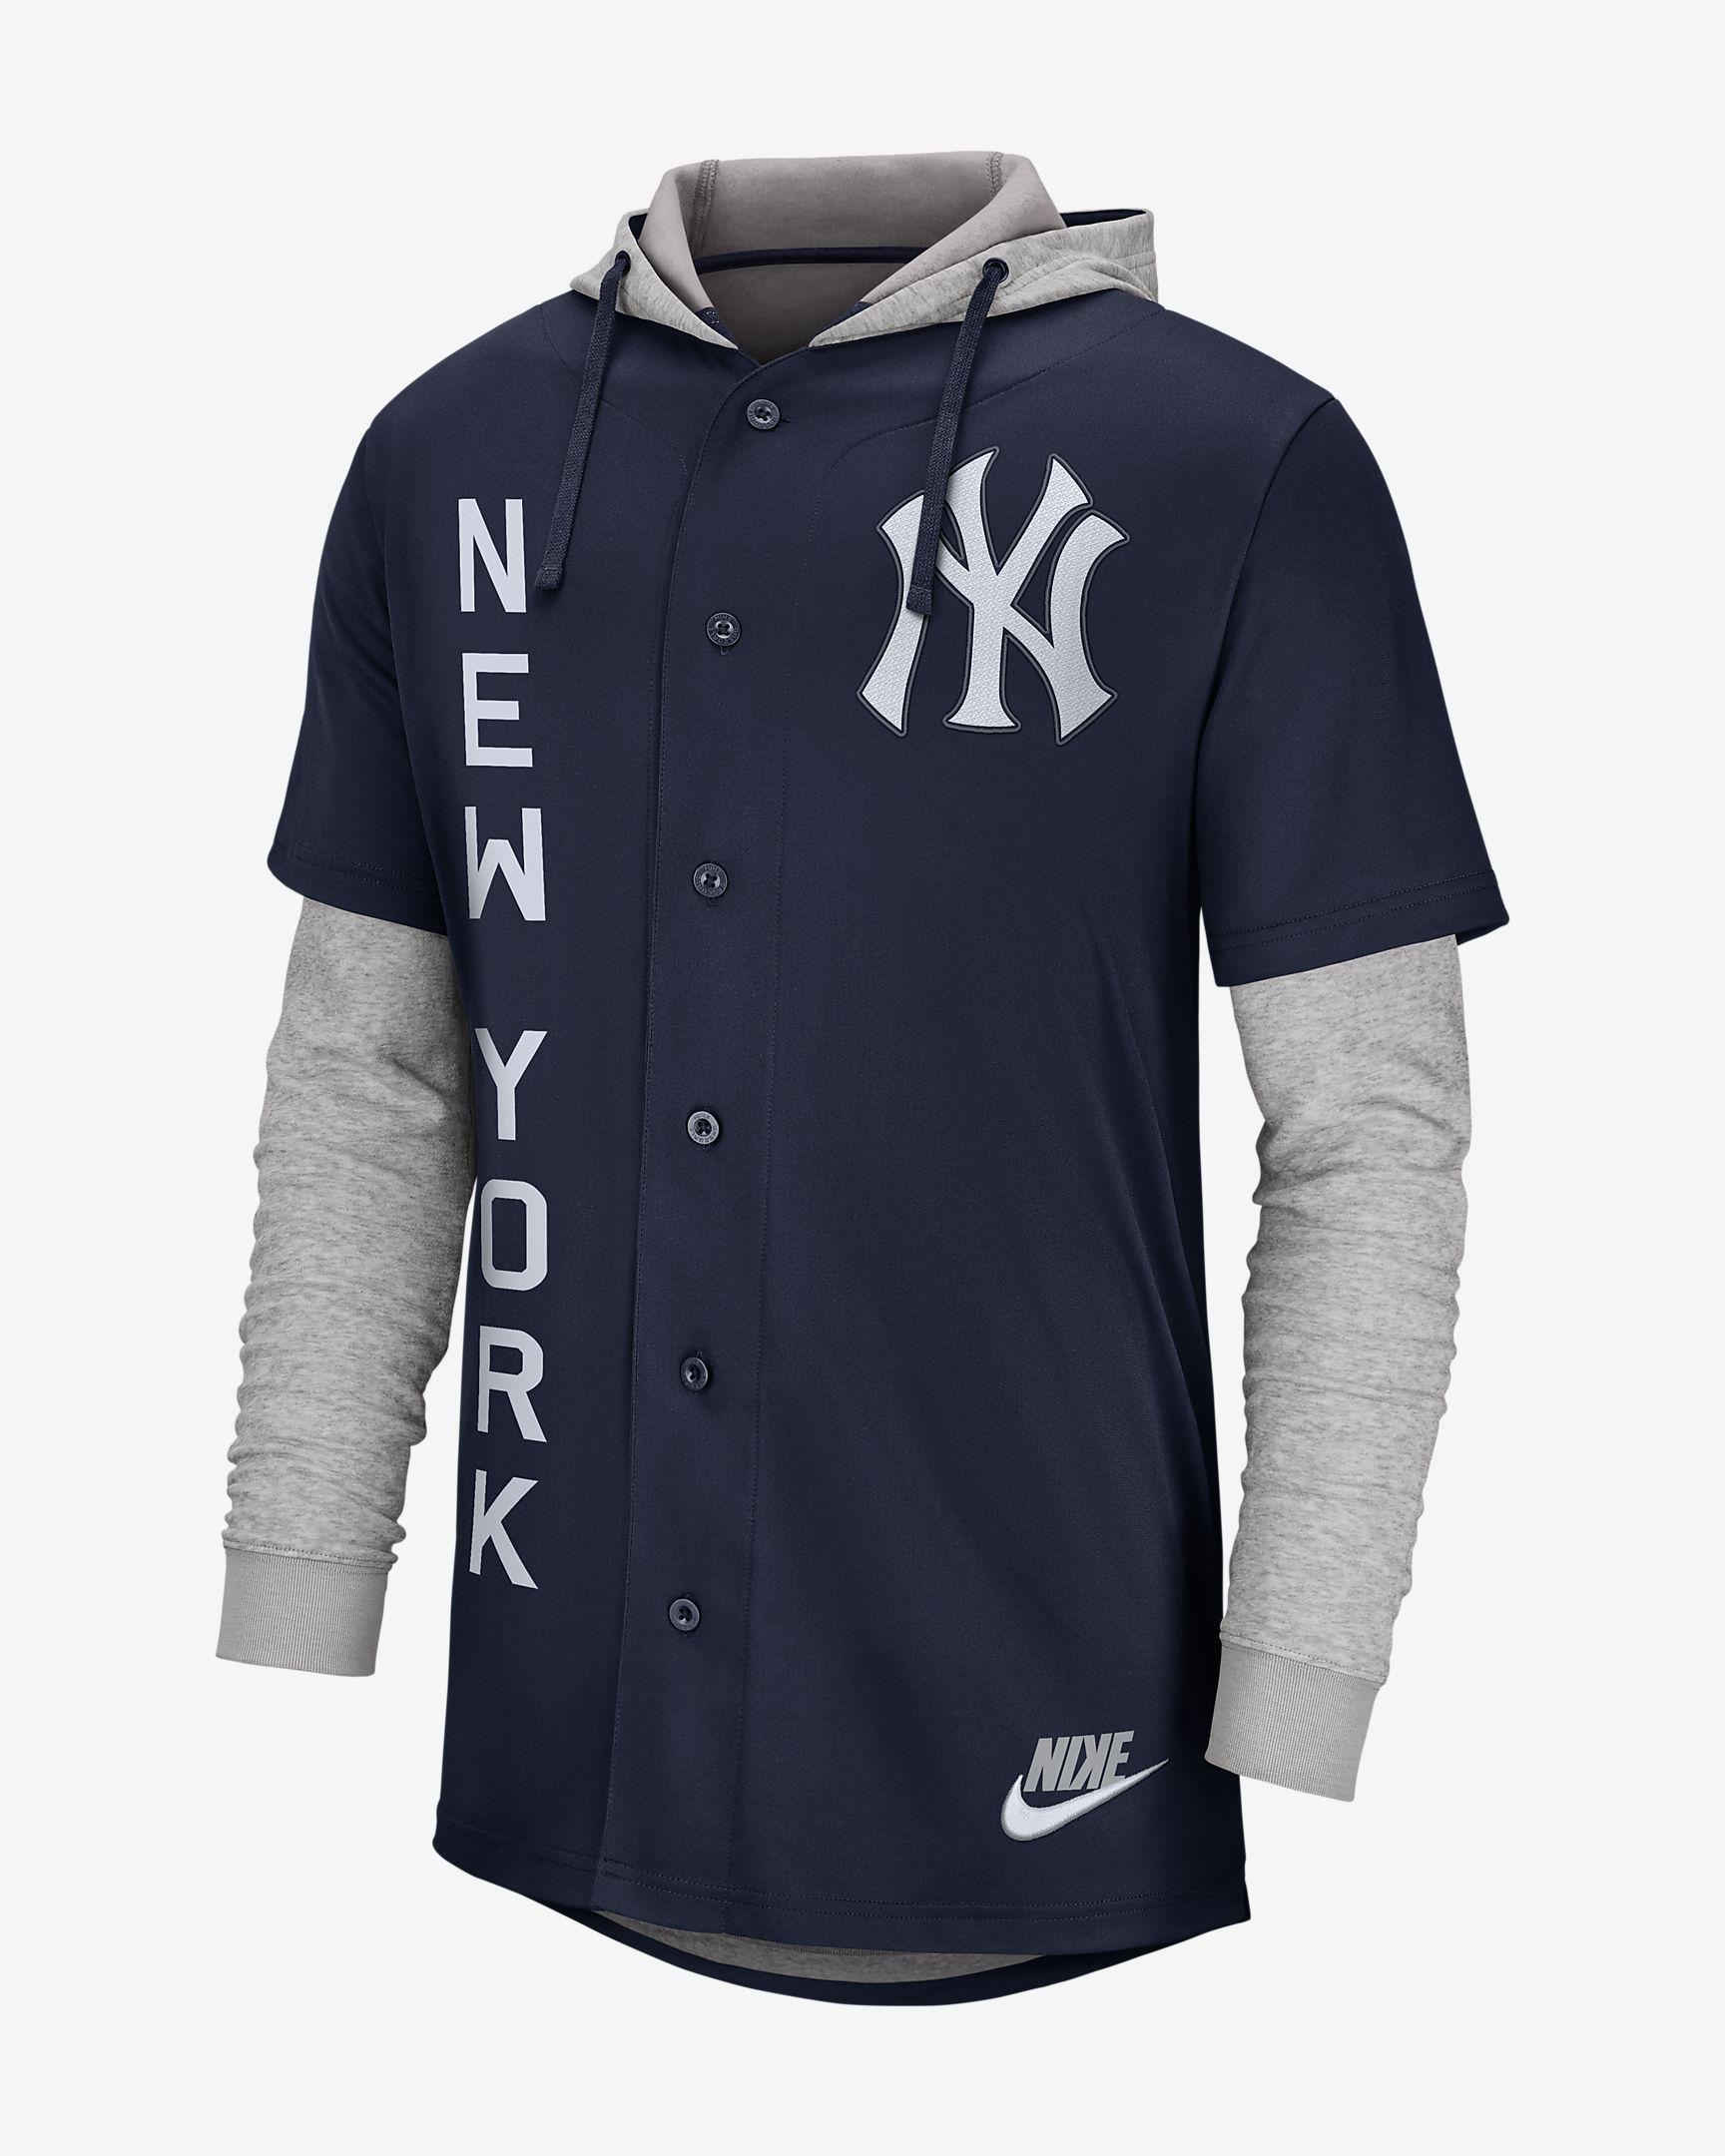 yankees-mens-hooded-baseball-jersey-kCGV